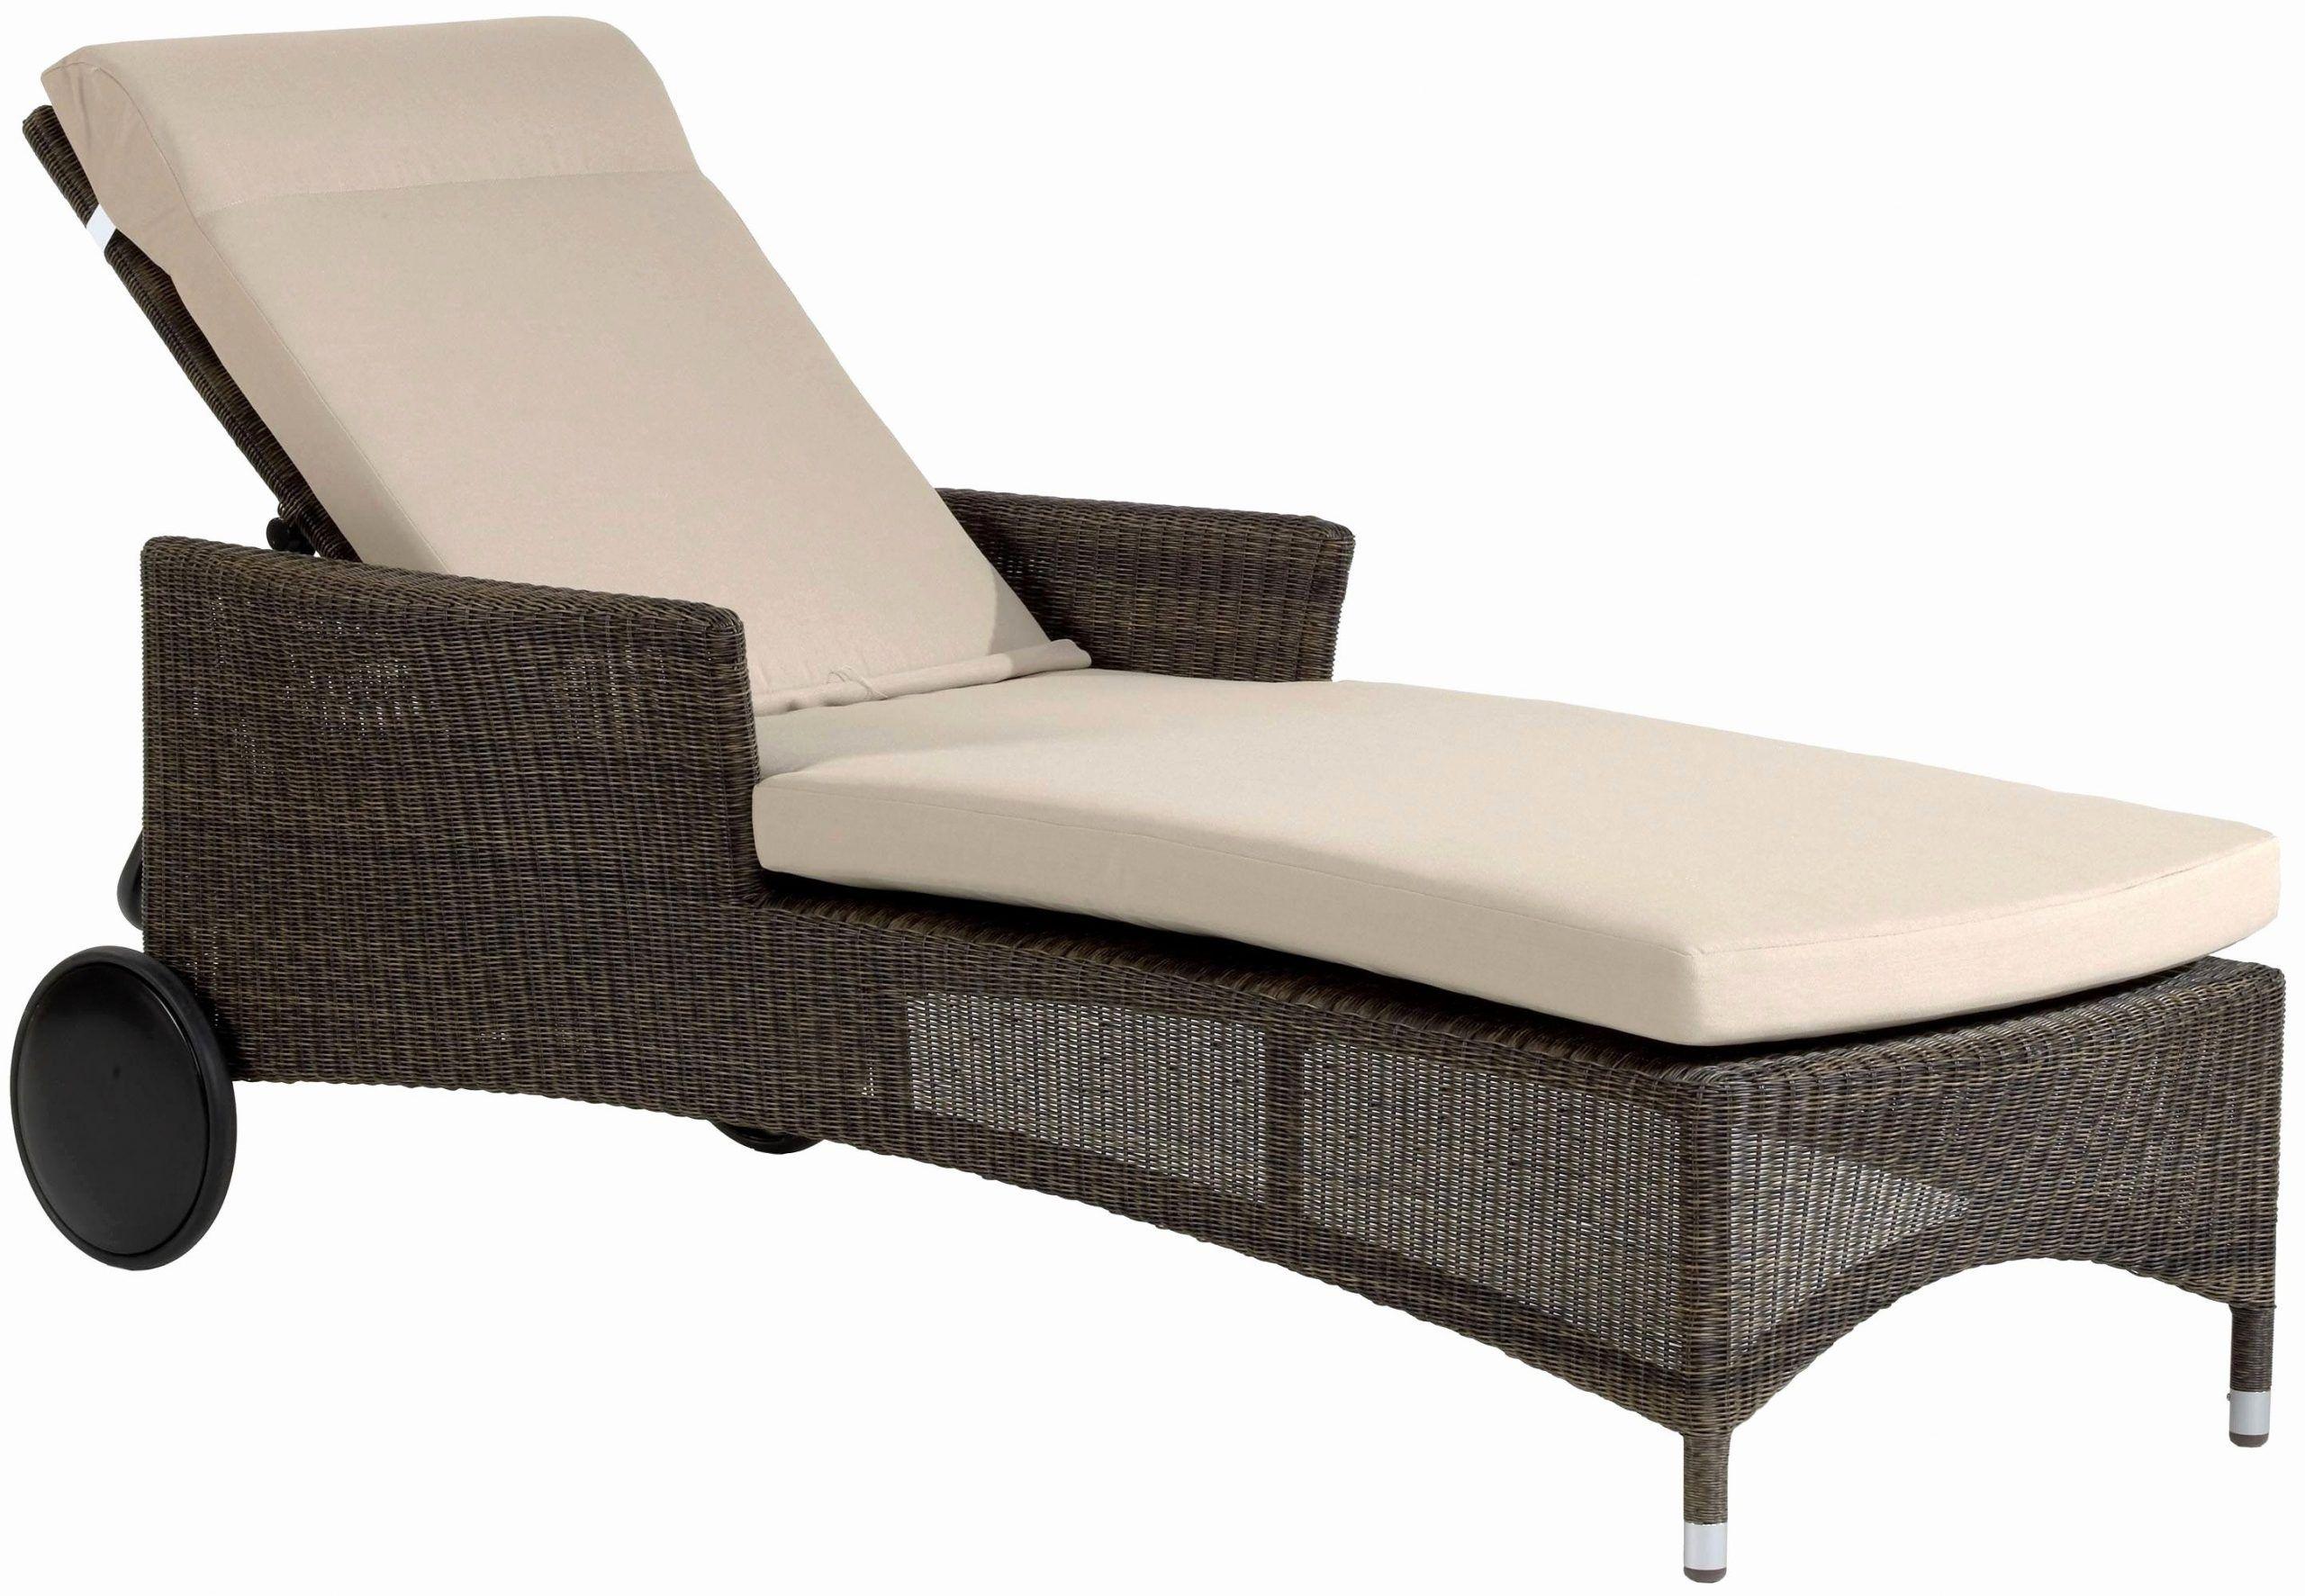 35 Luxe Chaise Pliante Tissu Bonnes Idees Chaise Longue Pliante Xl Chaise P In 2020 Outdoor Furniture Furniture Home Decor